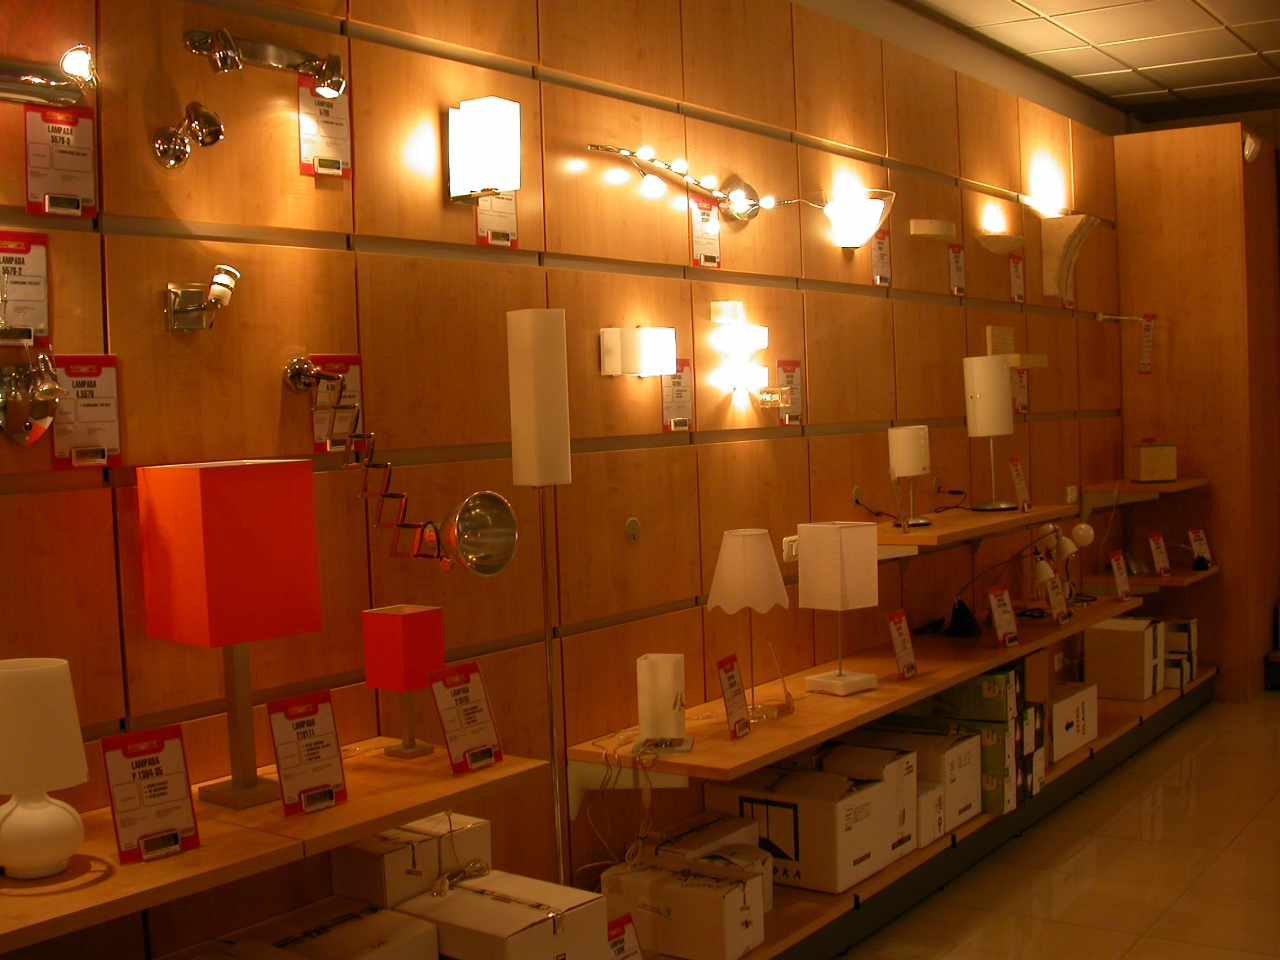 Arredamento per negozi di elettronica toscana belardi for Catene di arredamento